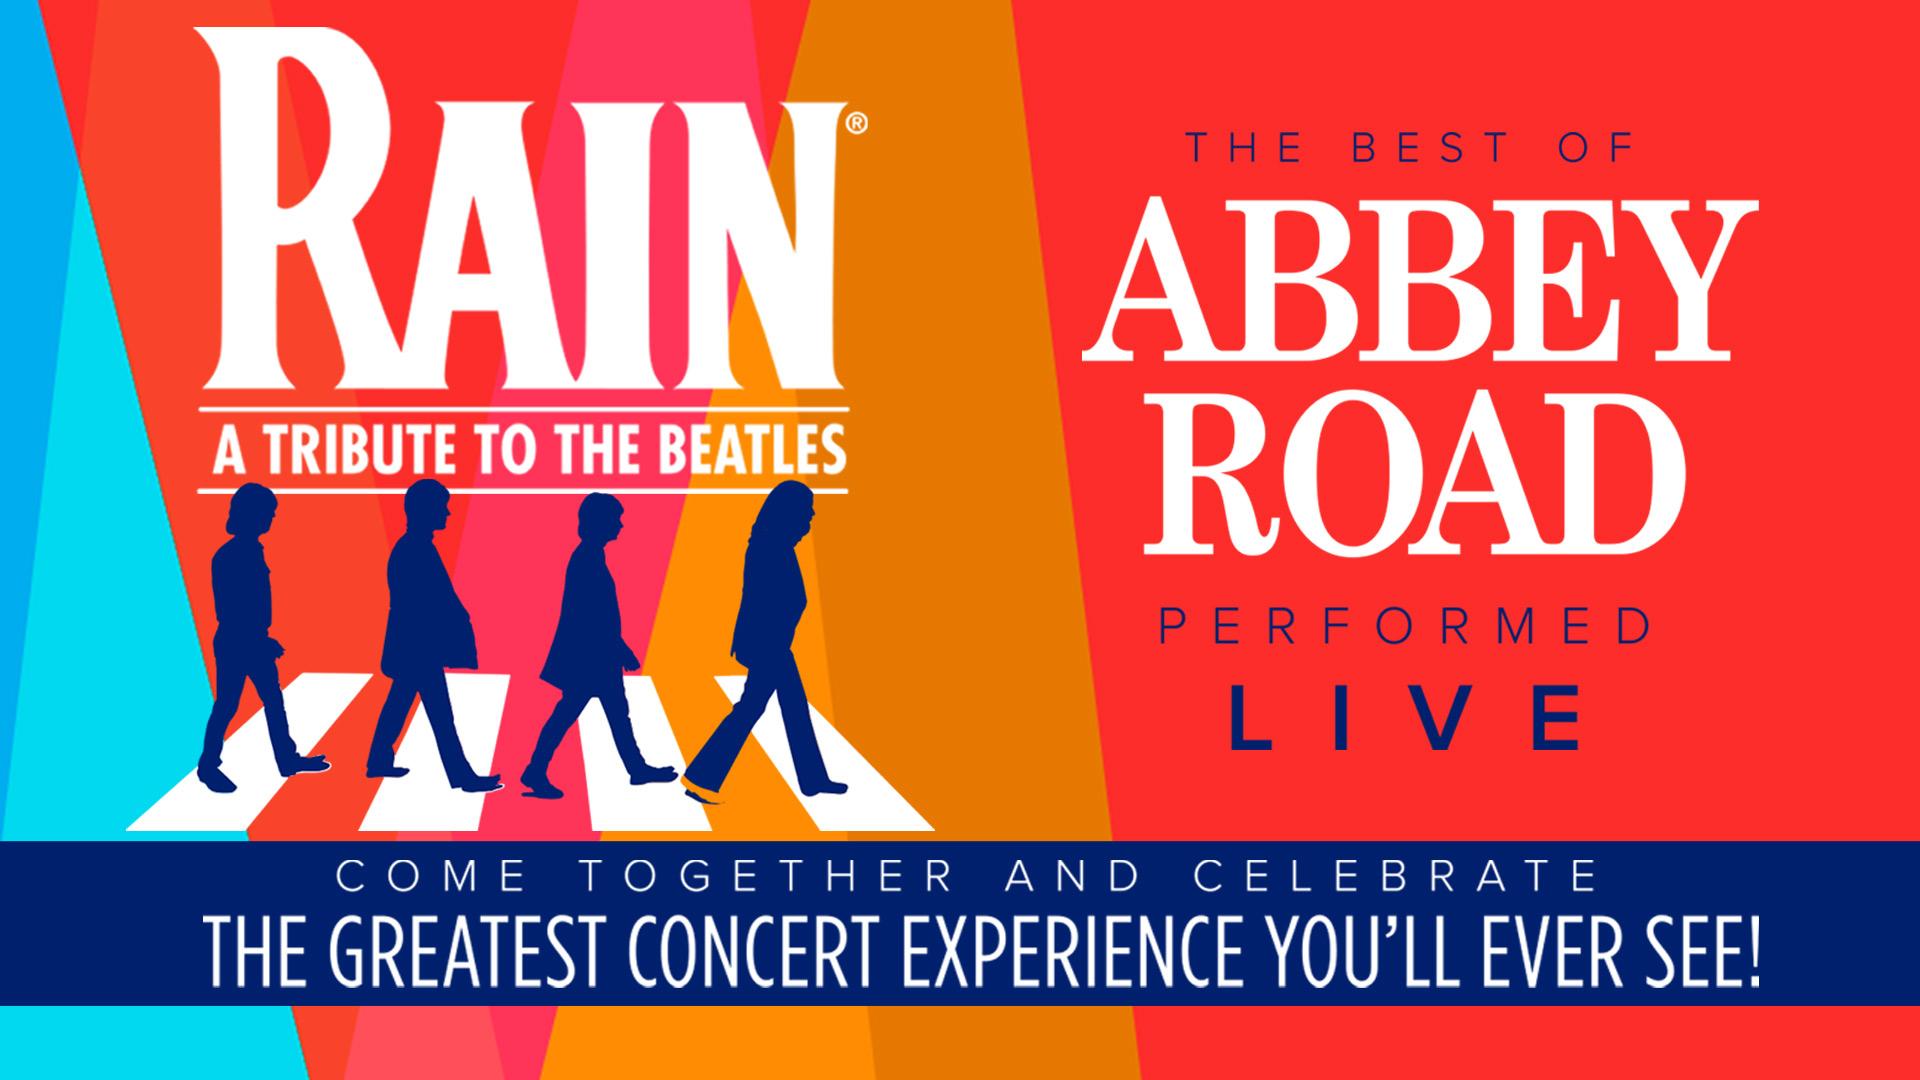 RAIN, Beatles Tribute, tysons, capital one hall, things to do, capital one center, The Beatles, tribute band, Yellow Submarine, Abbey Road